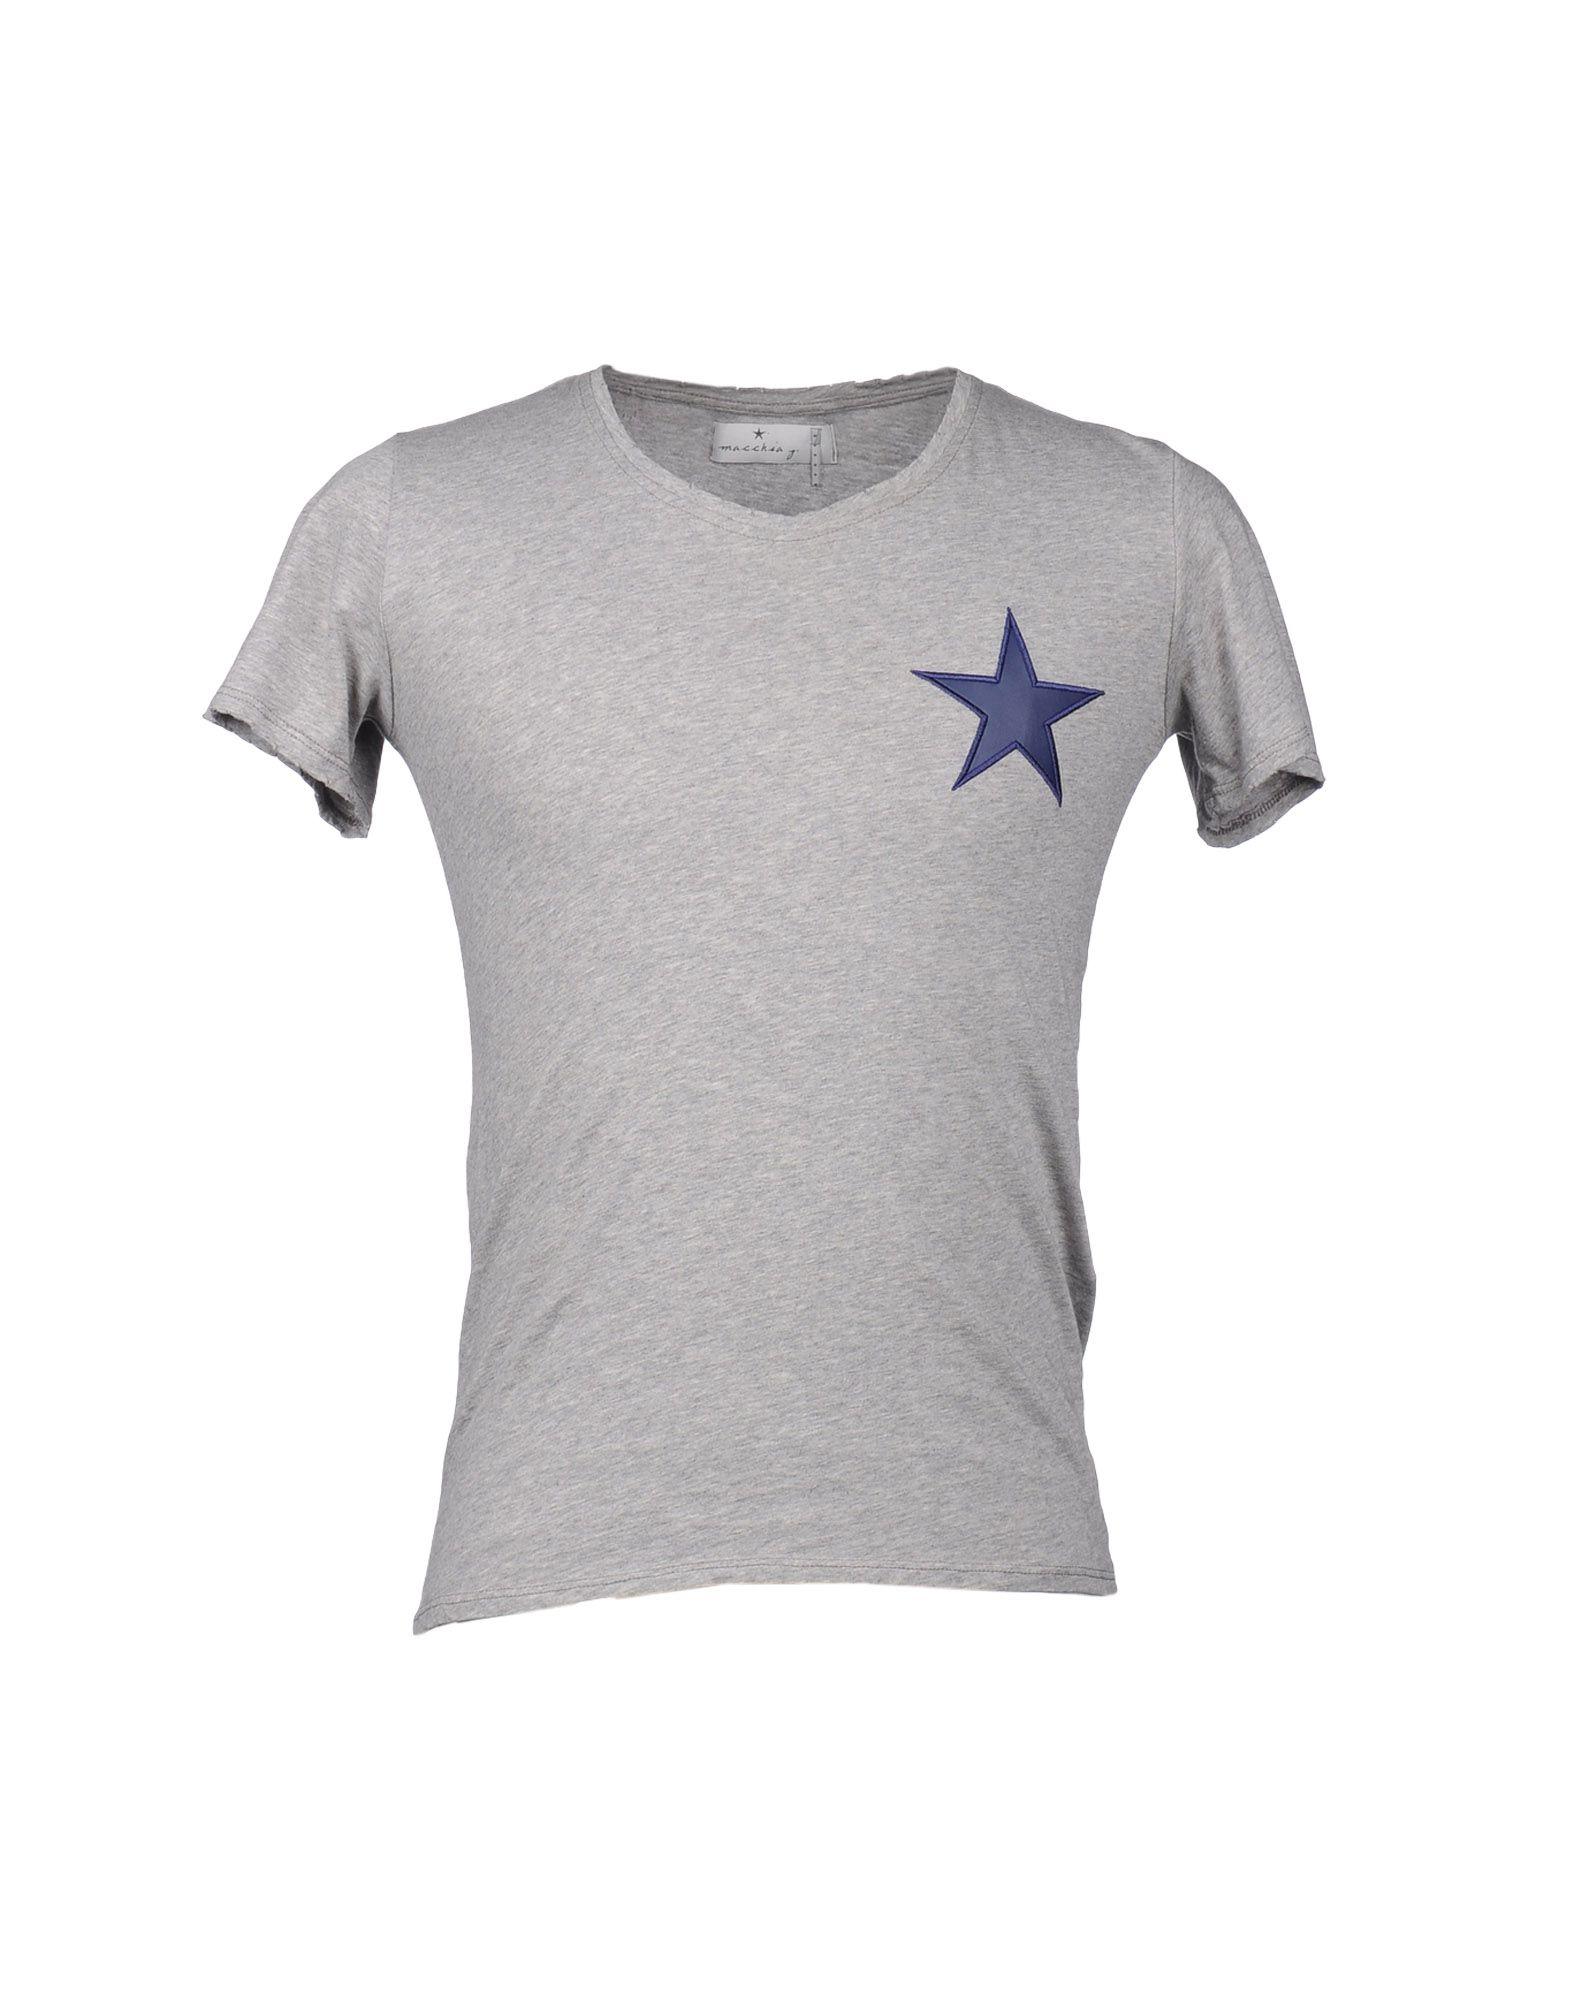 MACCHIA J Футболка с короткими рукавами футболка поло большого размера с короткими рукавами